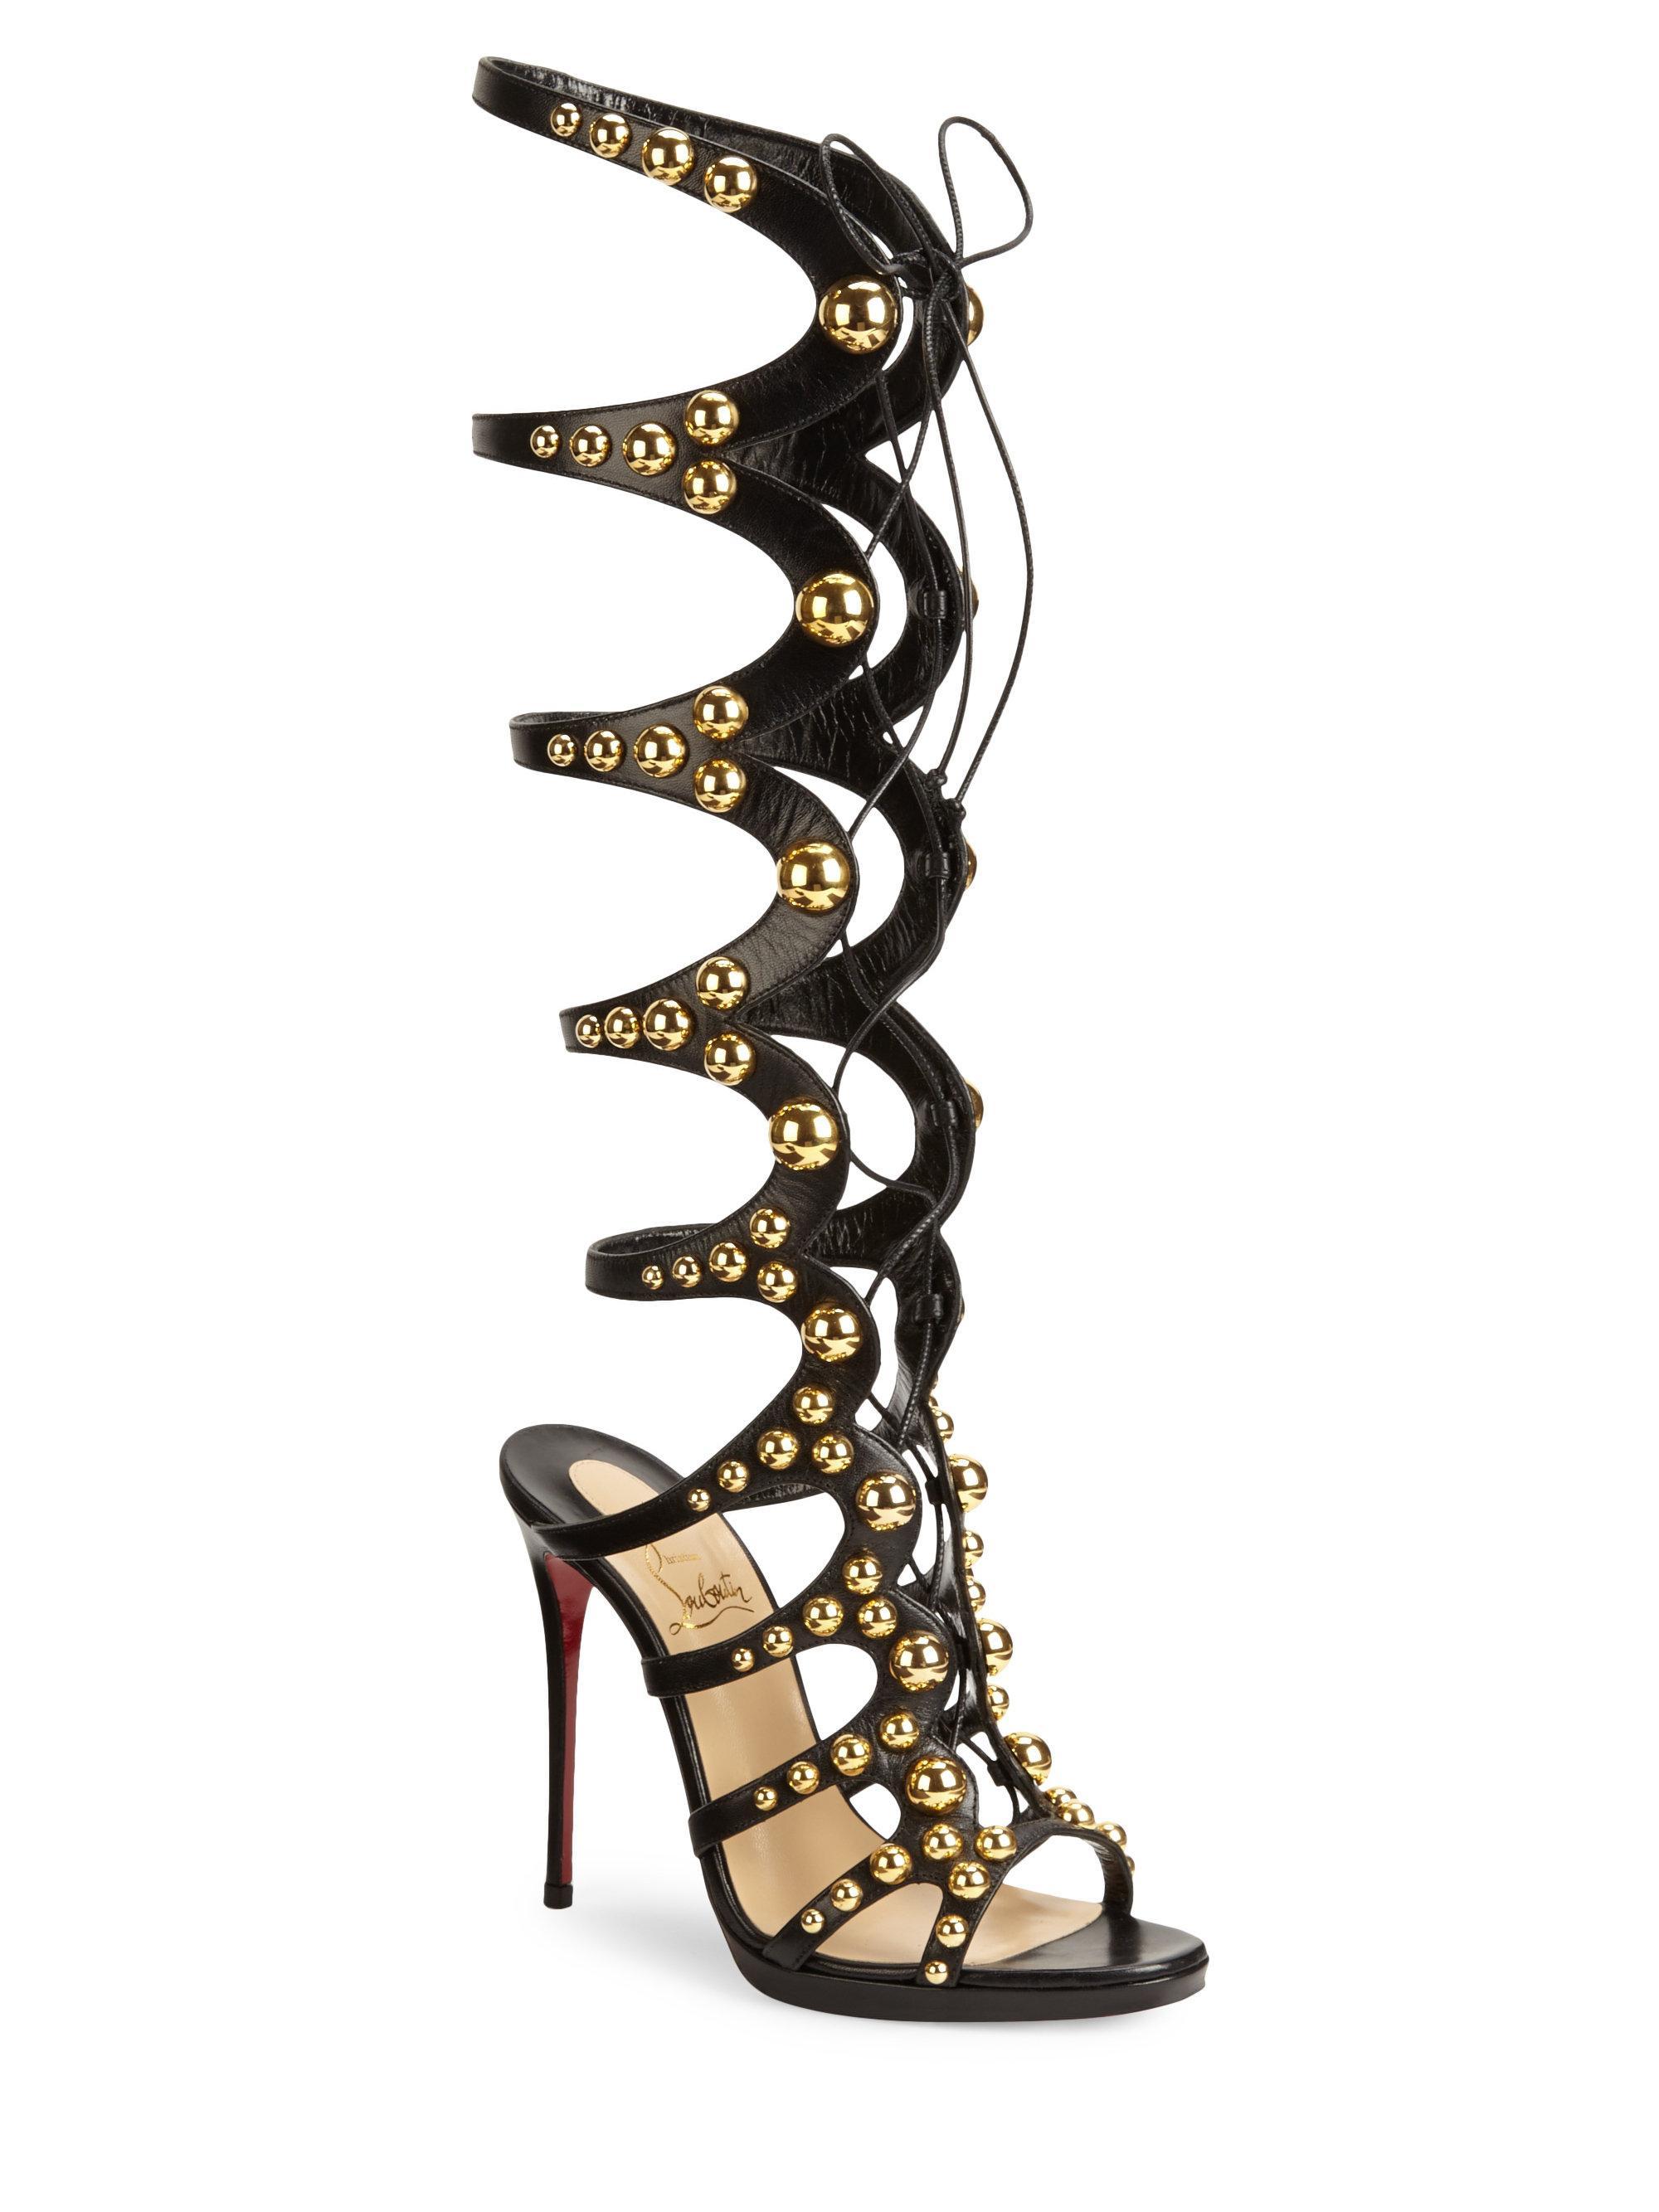 the latest 034fb c7aa5 Christian Louboutin Black Amazoutiful Knee-high Leather Gladiator Heels